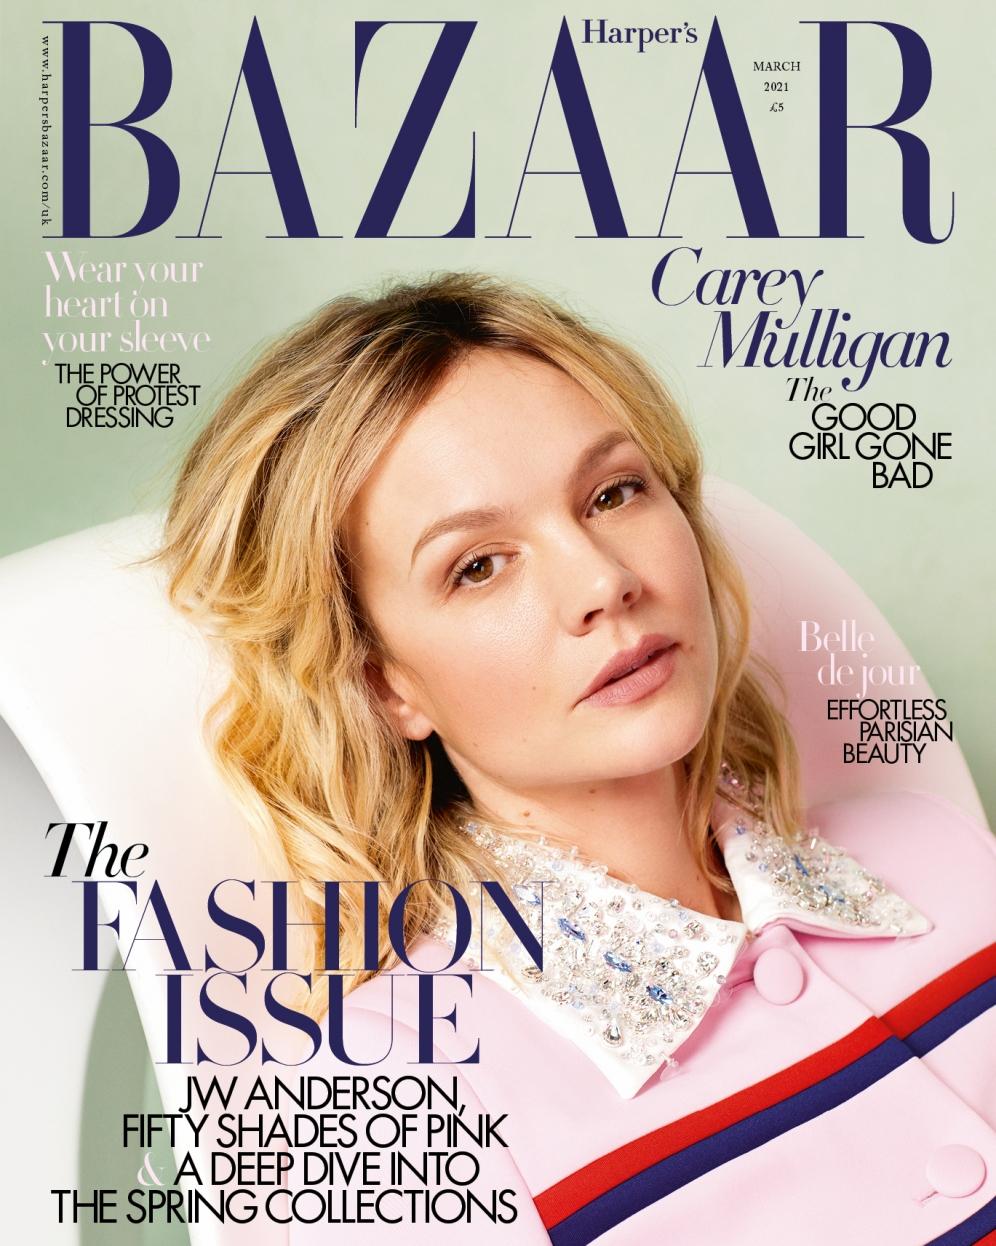 Carey Mulligan | Harpers Bazaar